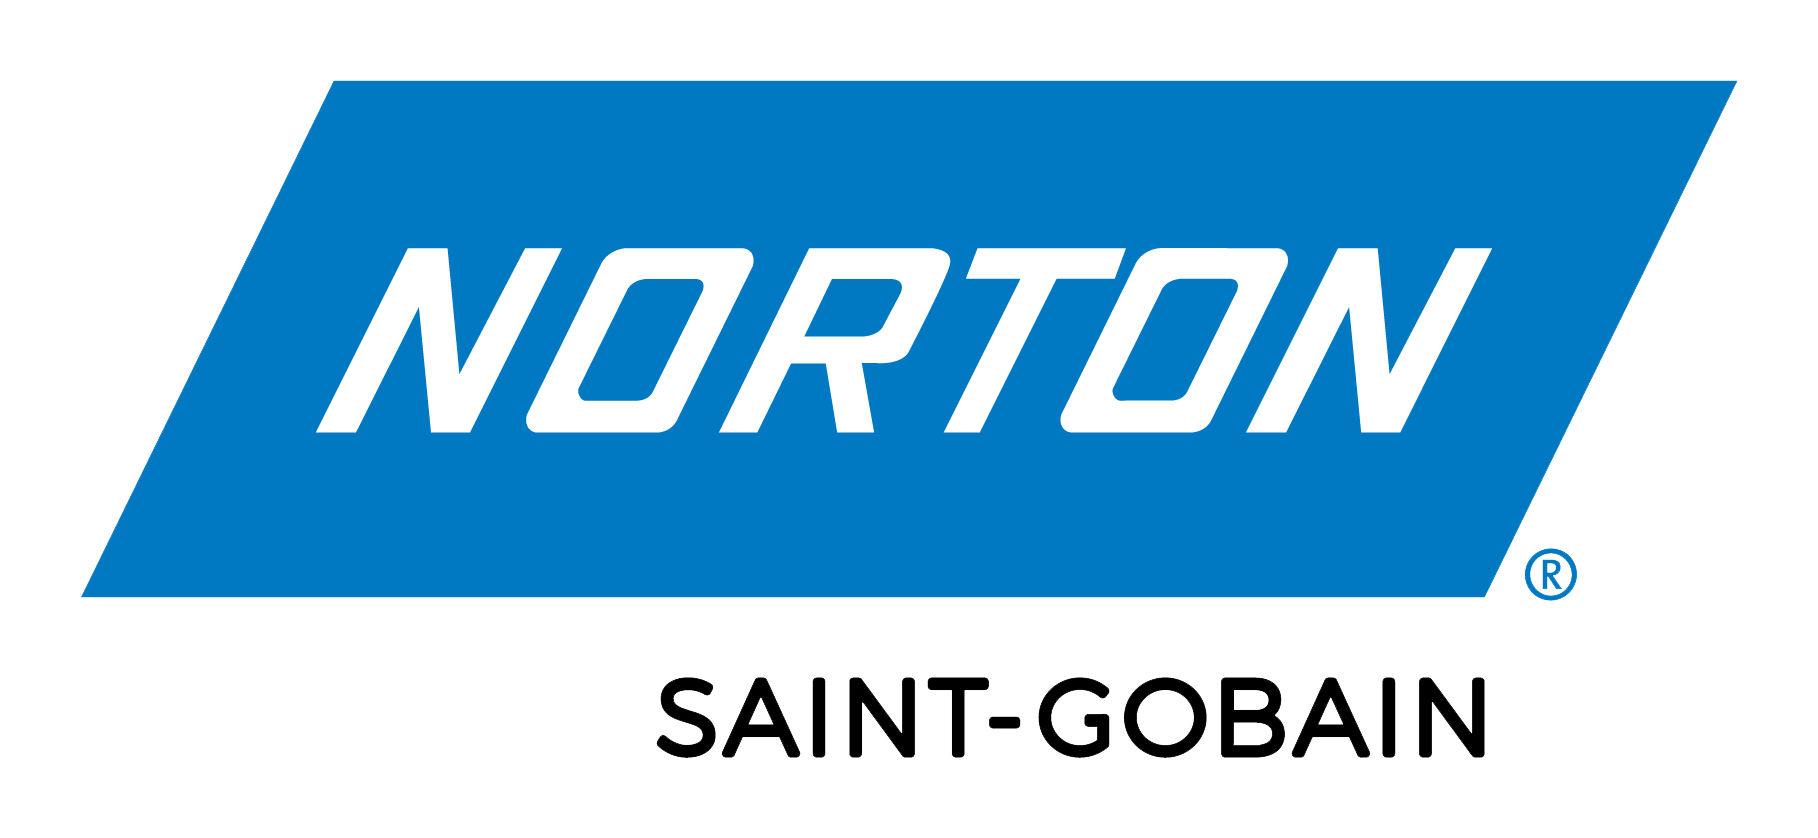 SG_Norton_logo_rgb_0